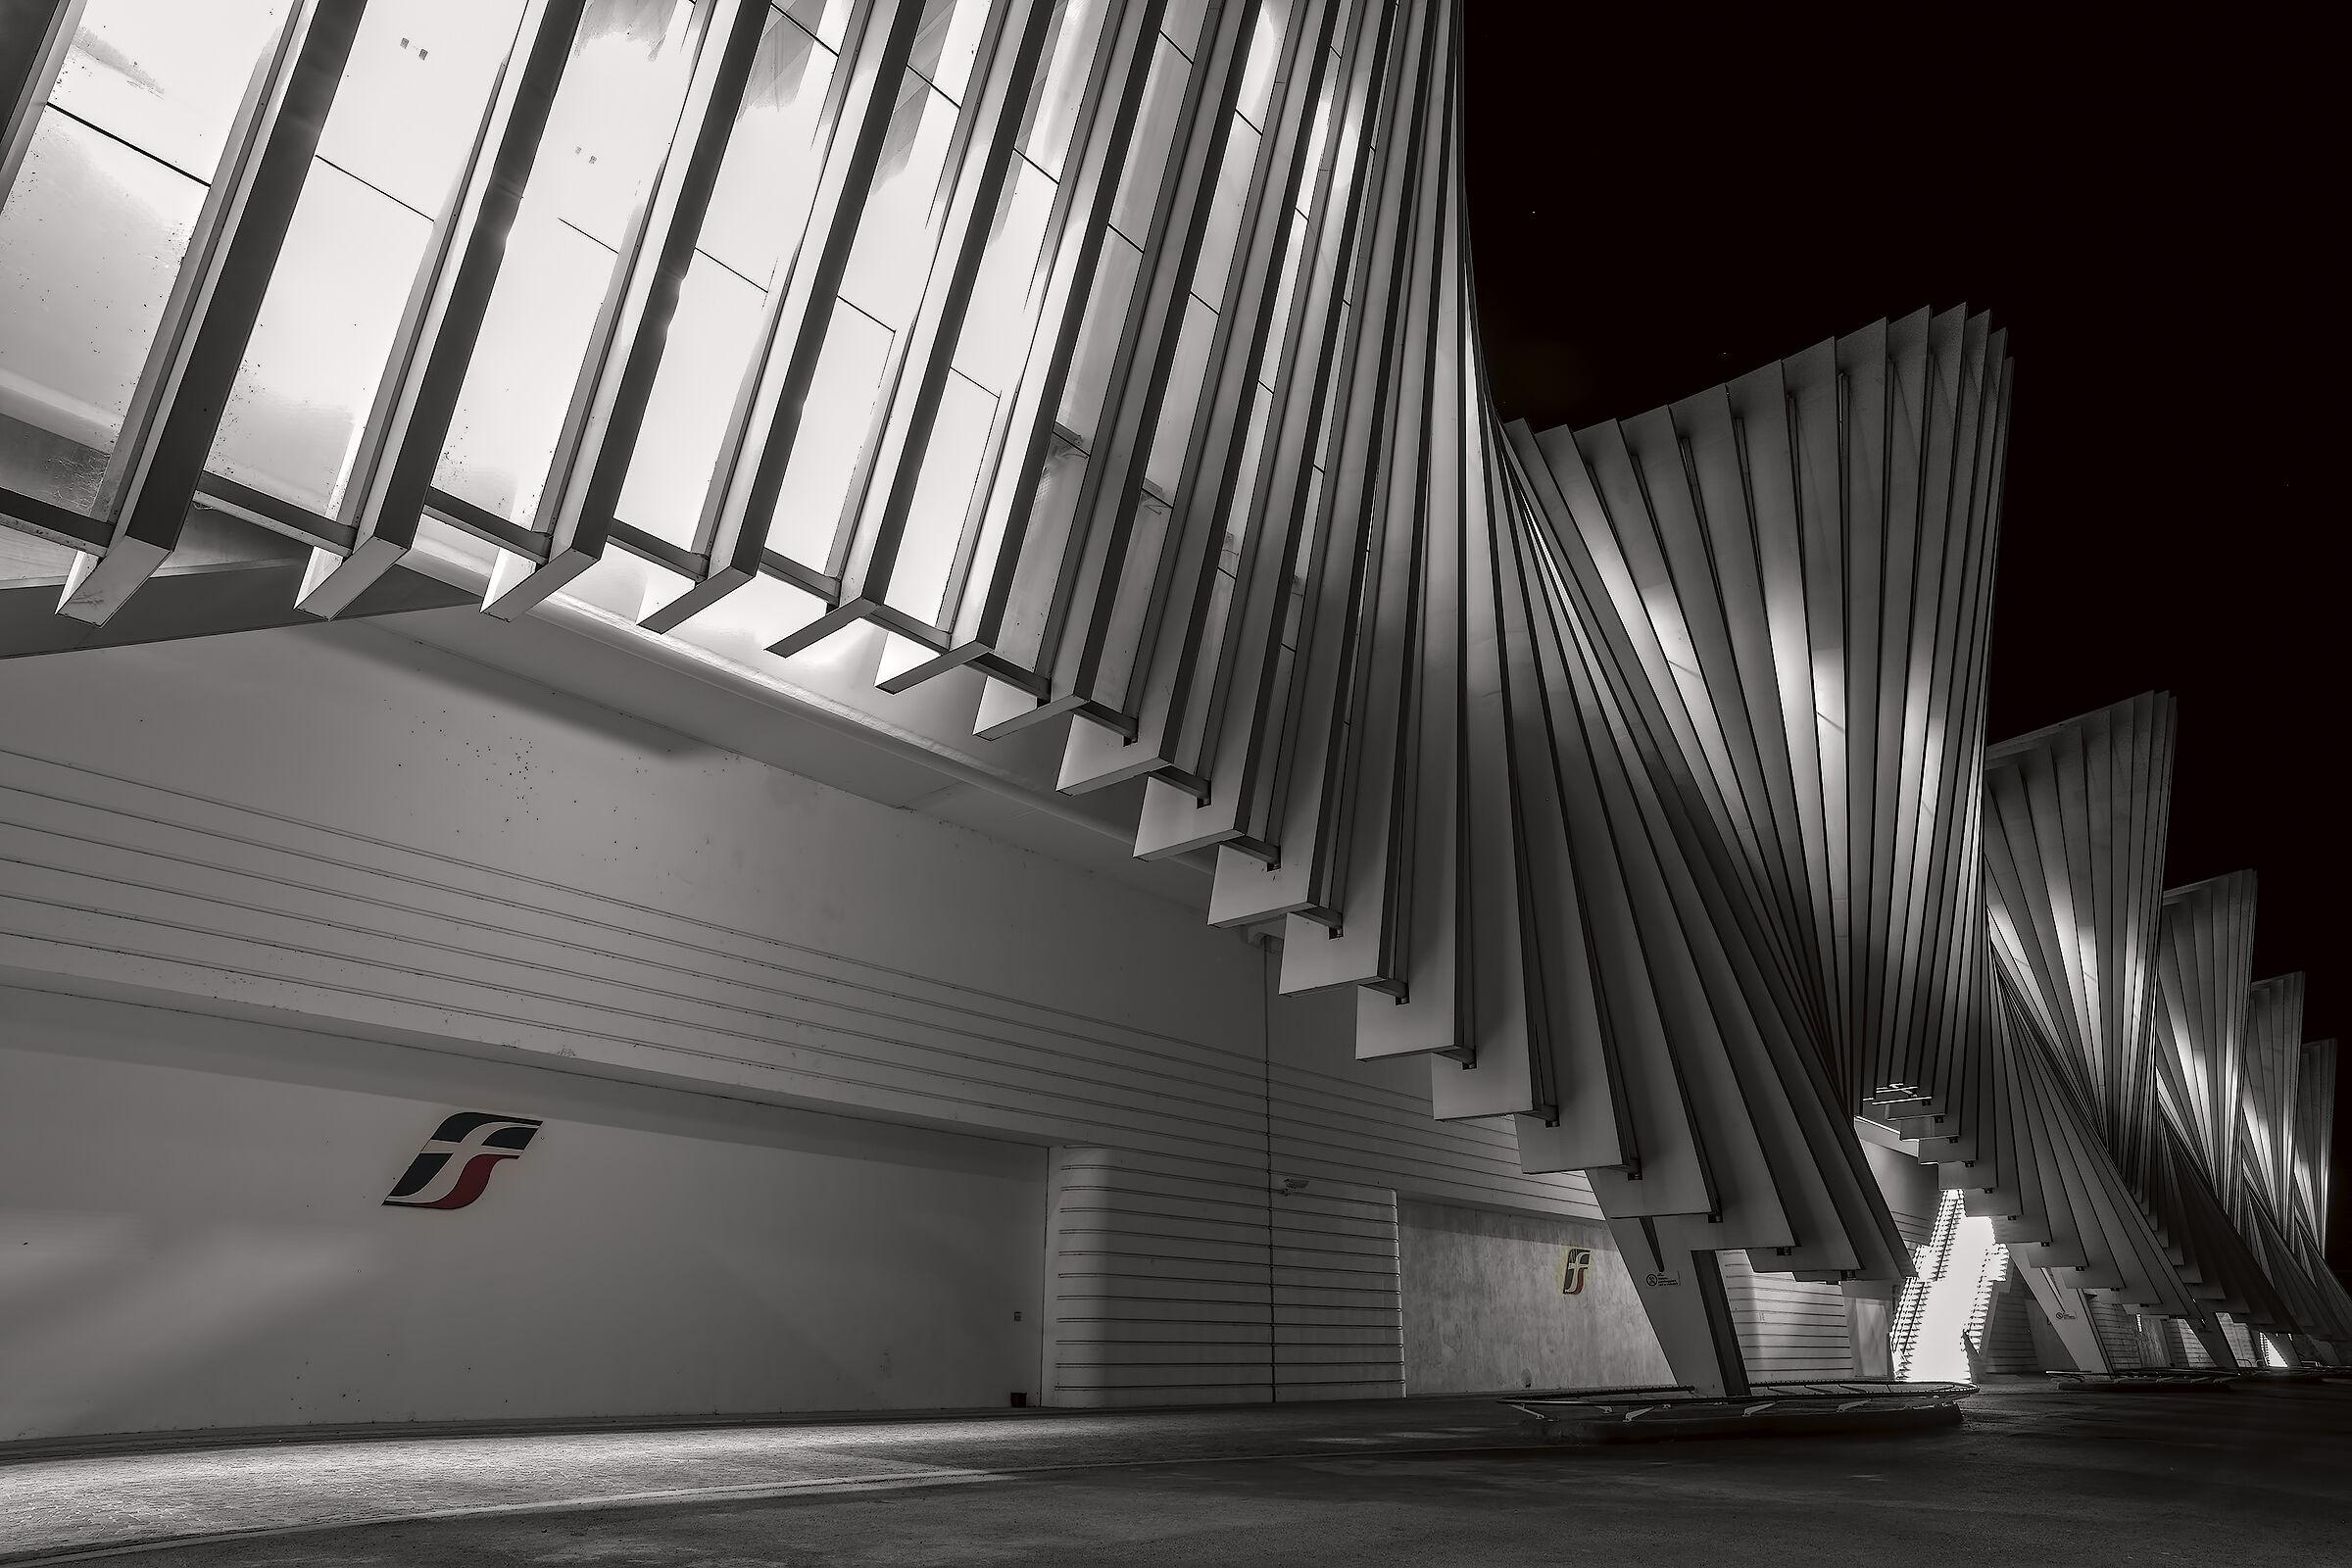 Middle Padana railway station Calatrava...